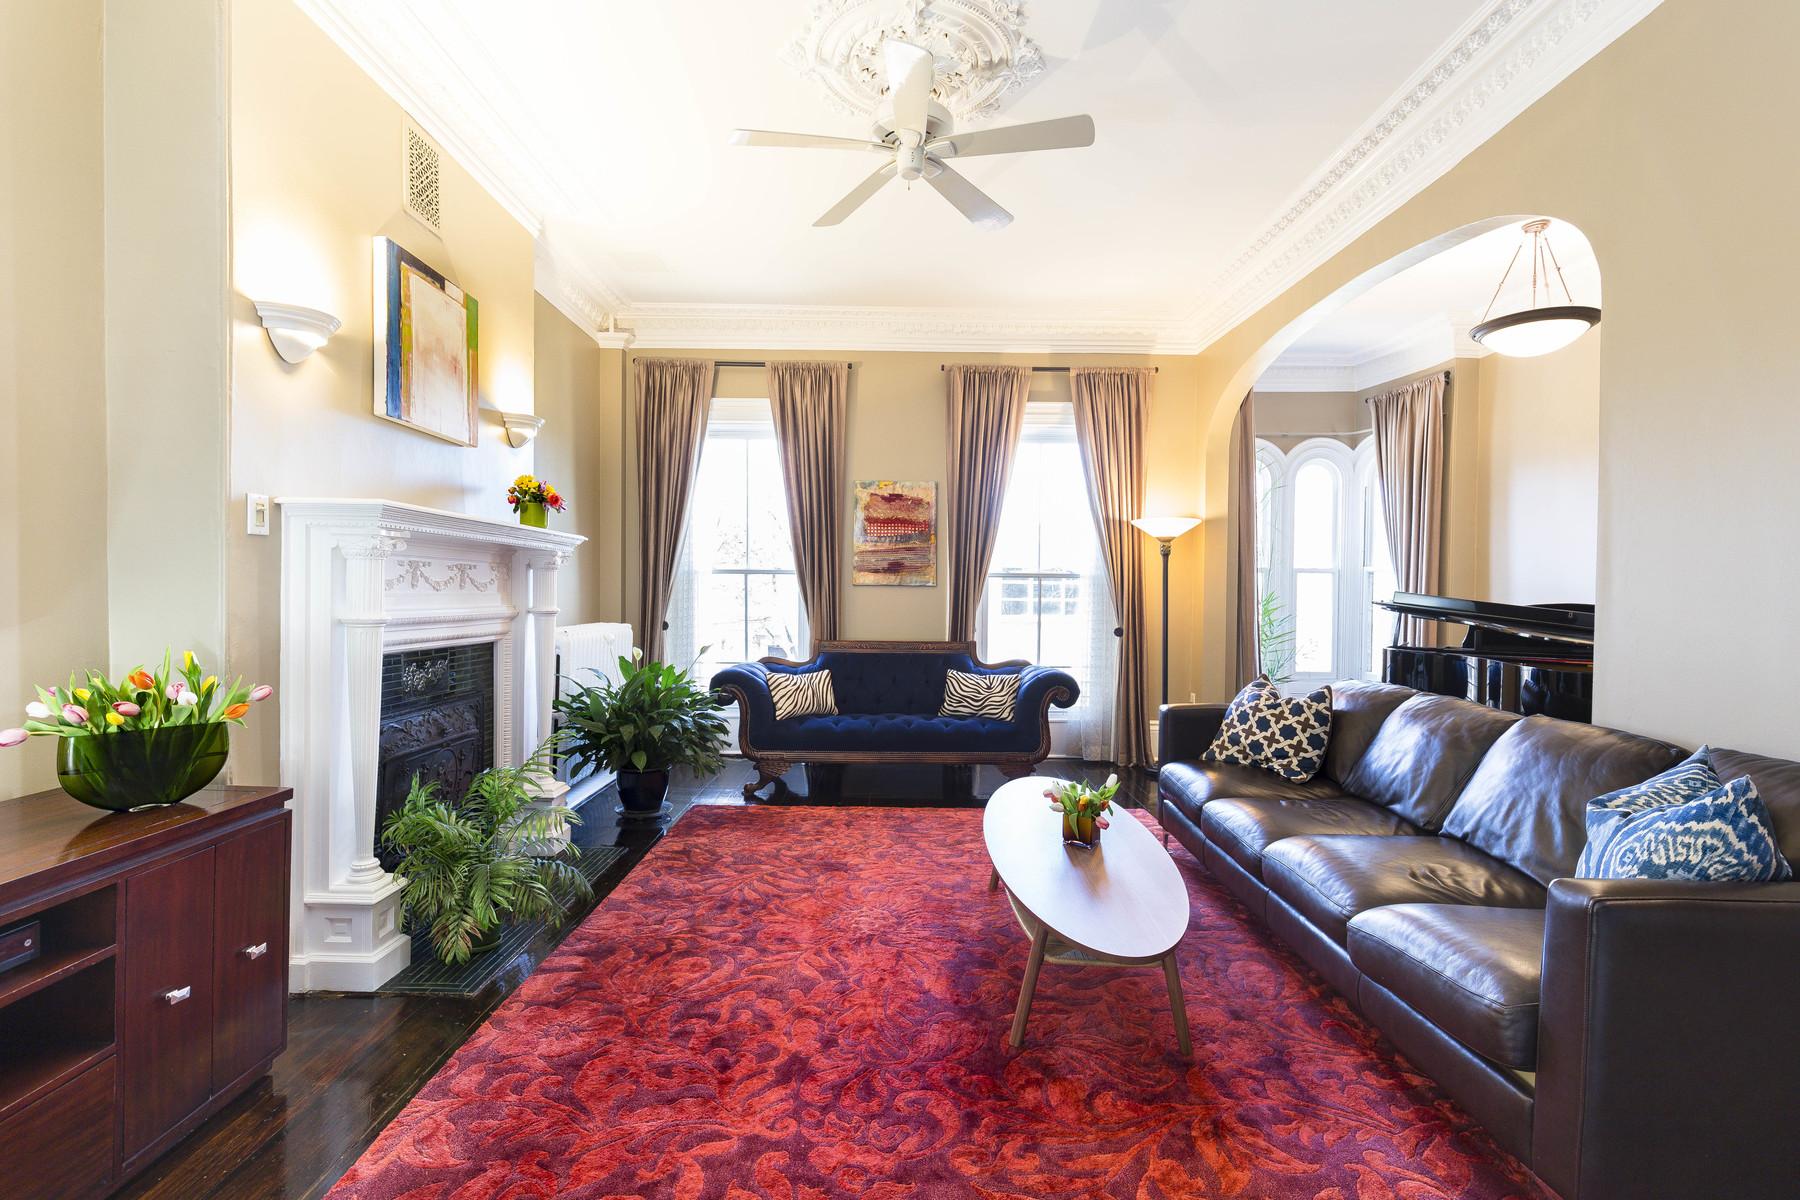 Кооперативная квартира для того Продажа на 63 Worcester Street Triplex 63 Worcester Street Unit 2 South End, Boston, Массачусетс, 02118 Соединенные Штаты